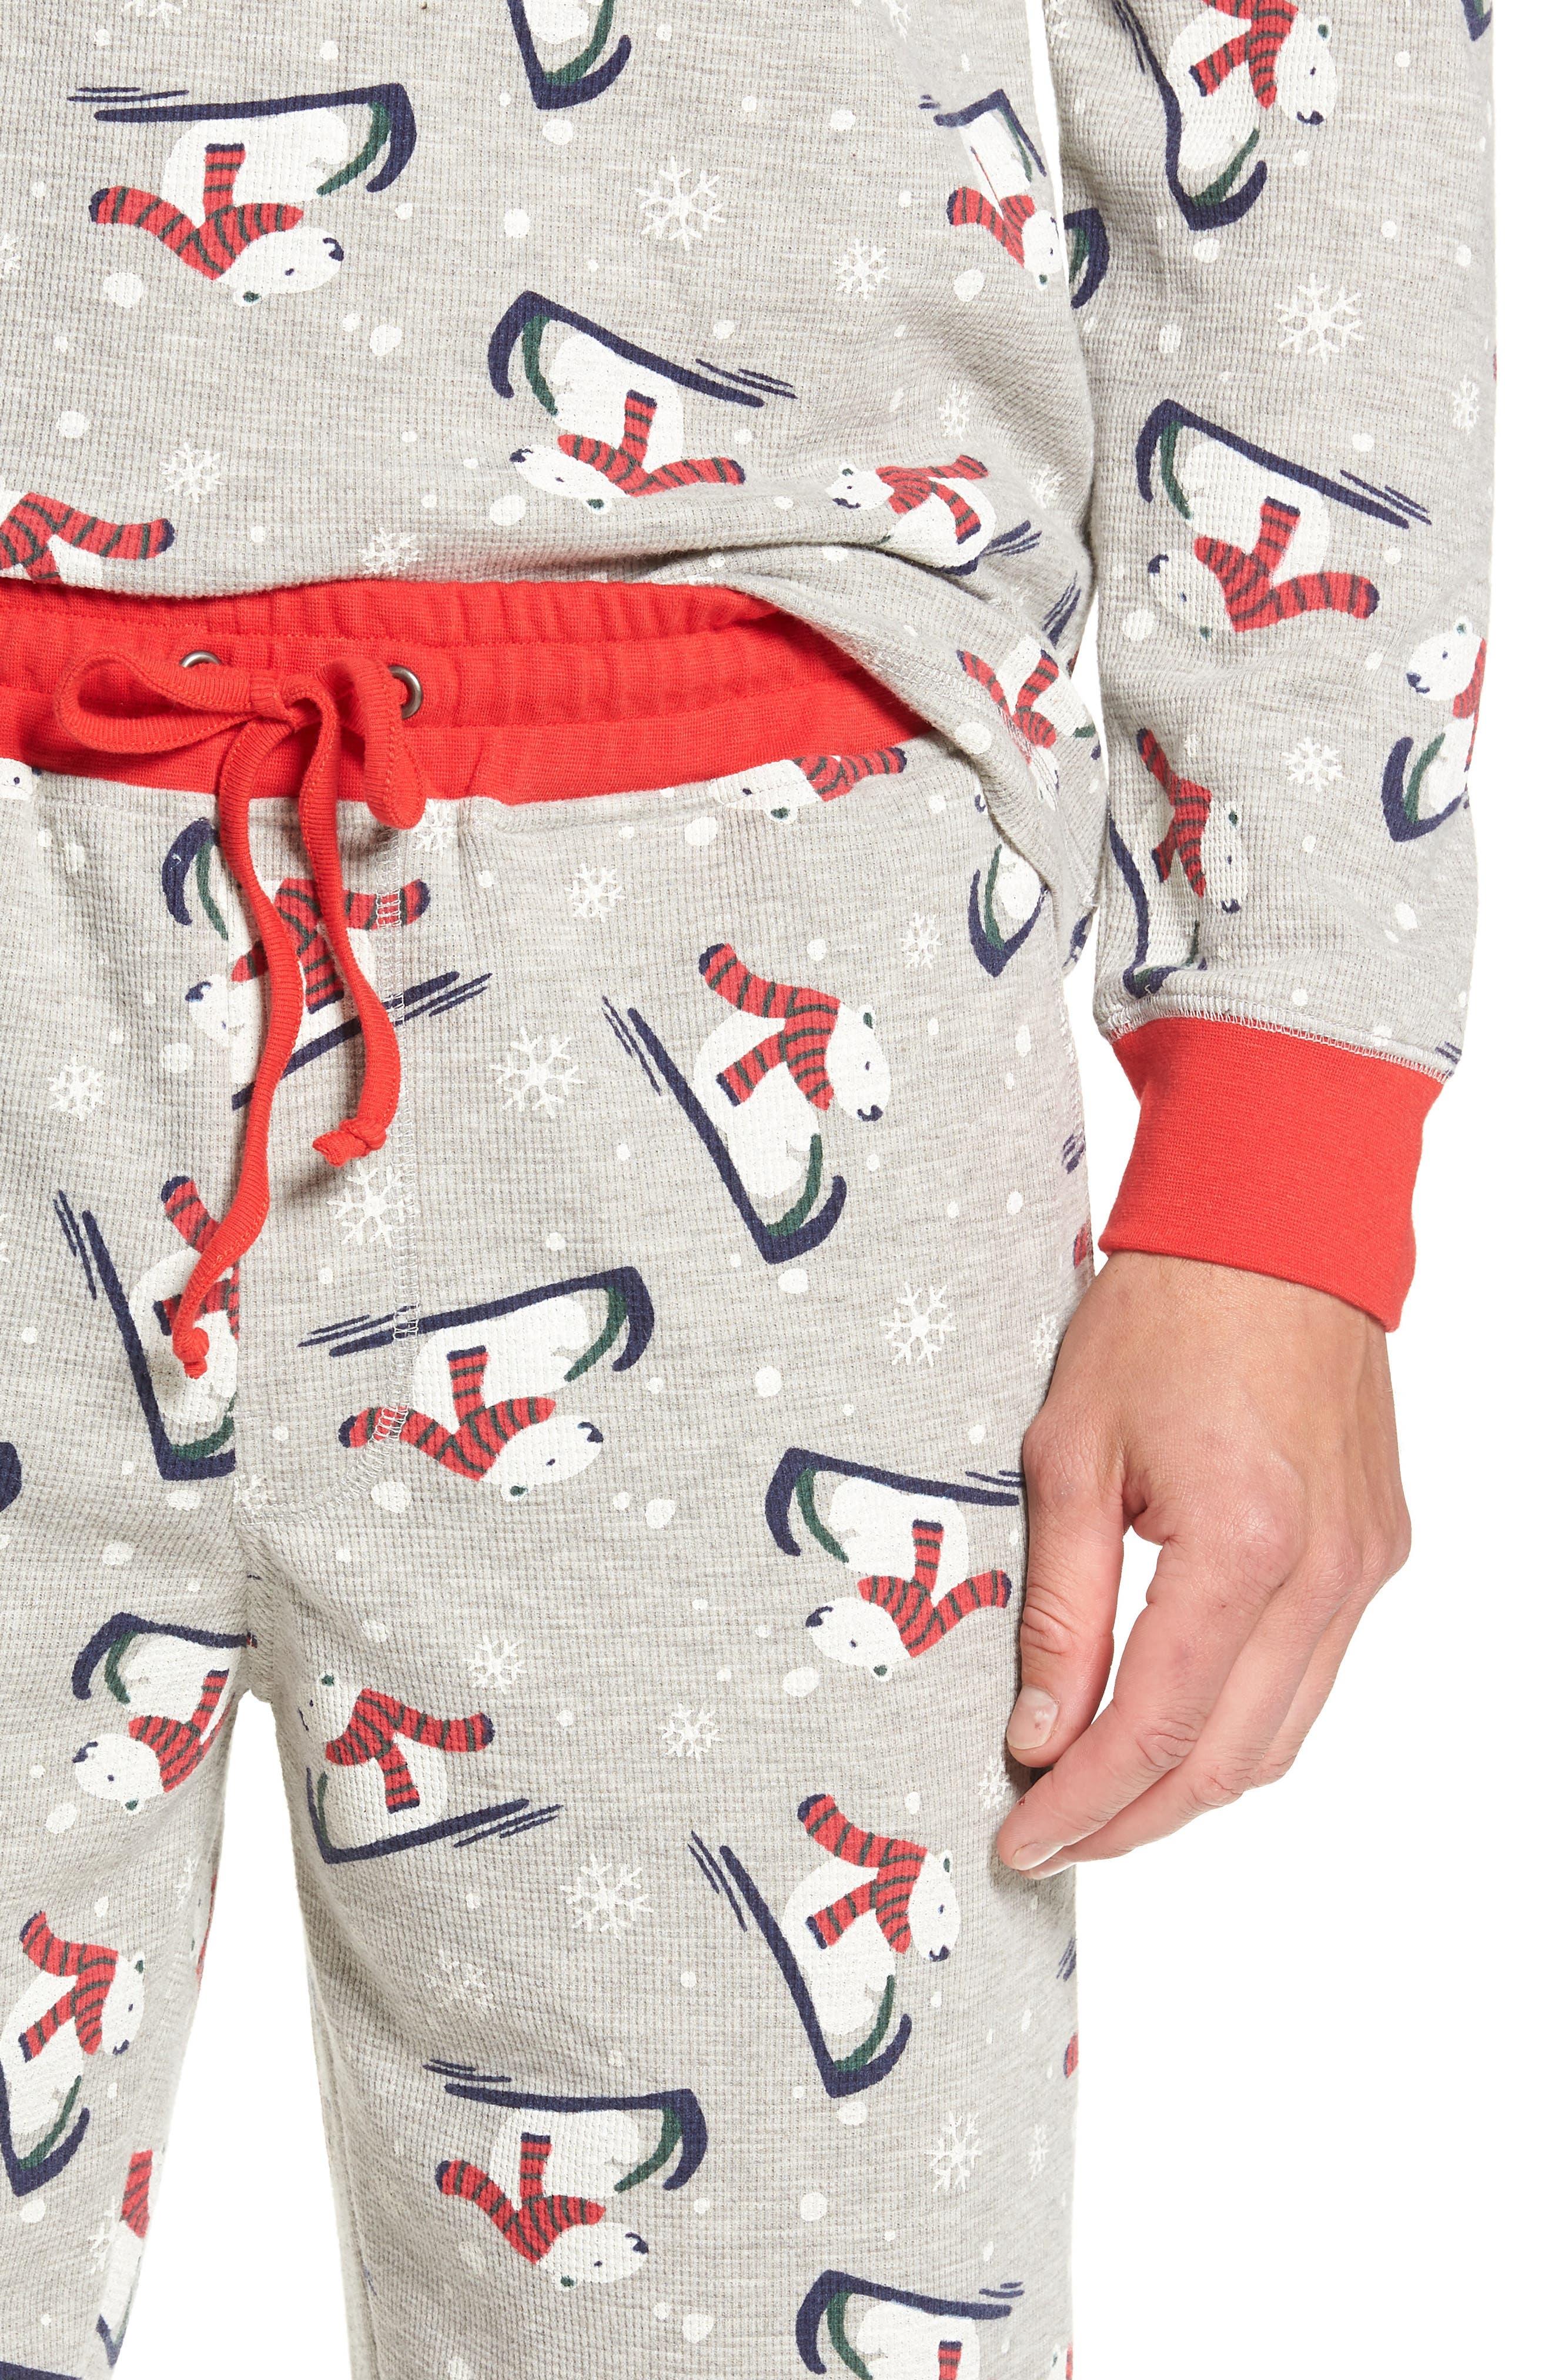 Family Father Thermal Pajamas,                             Alternate thumbnail 4, color,                             GREY PEARL HEATHER POLAR BEAR